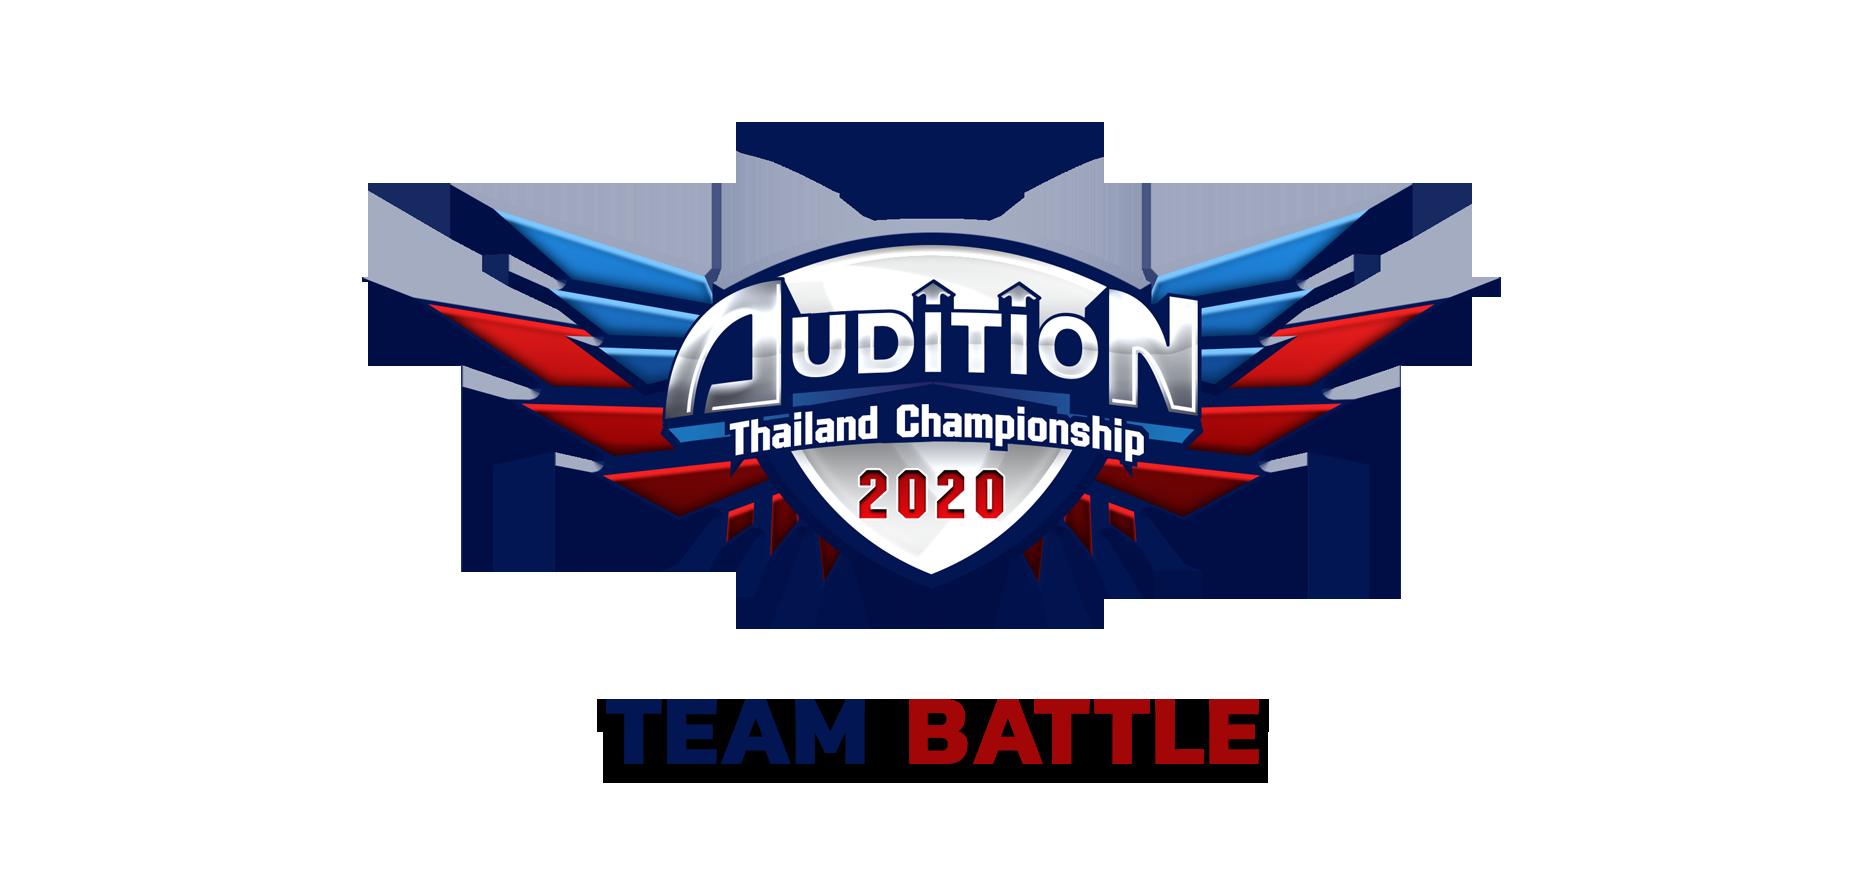 [ATC2020] AUDITION THAILAND CHAMPIONSHIP 2020